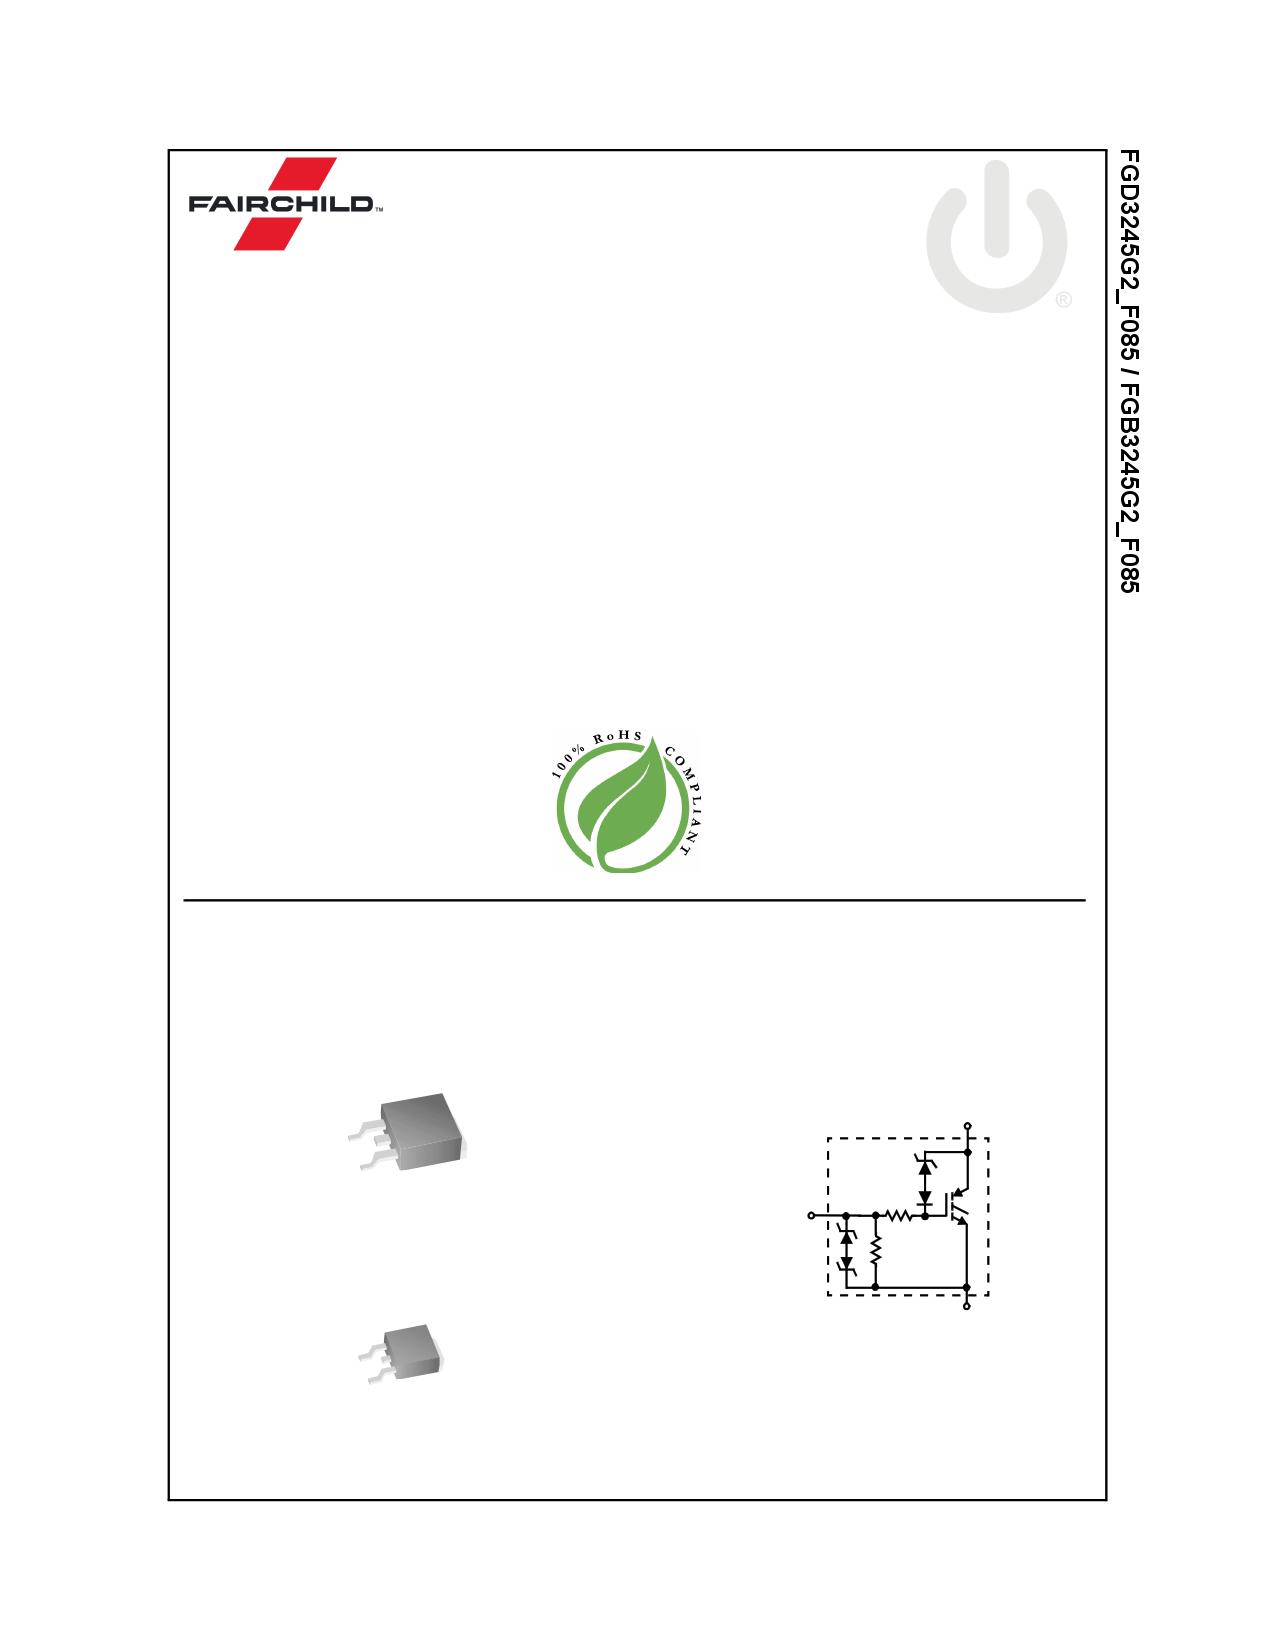 FGD3245G2_F085 데이터시트 및 FGD3245G2_F085 PDF